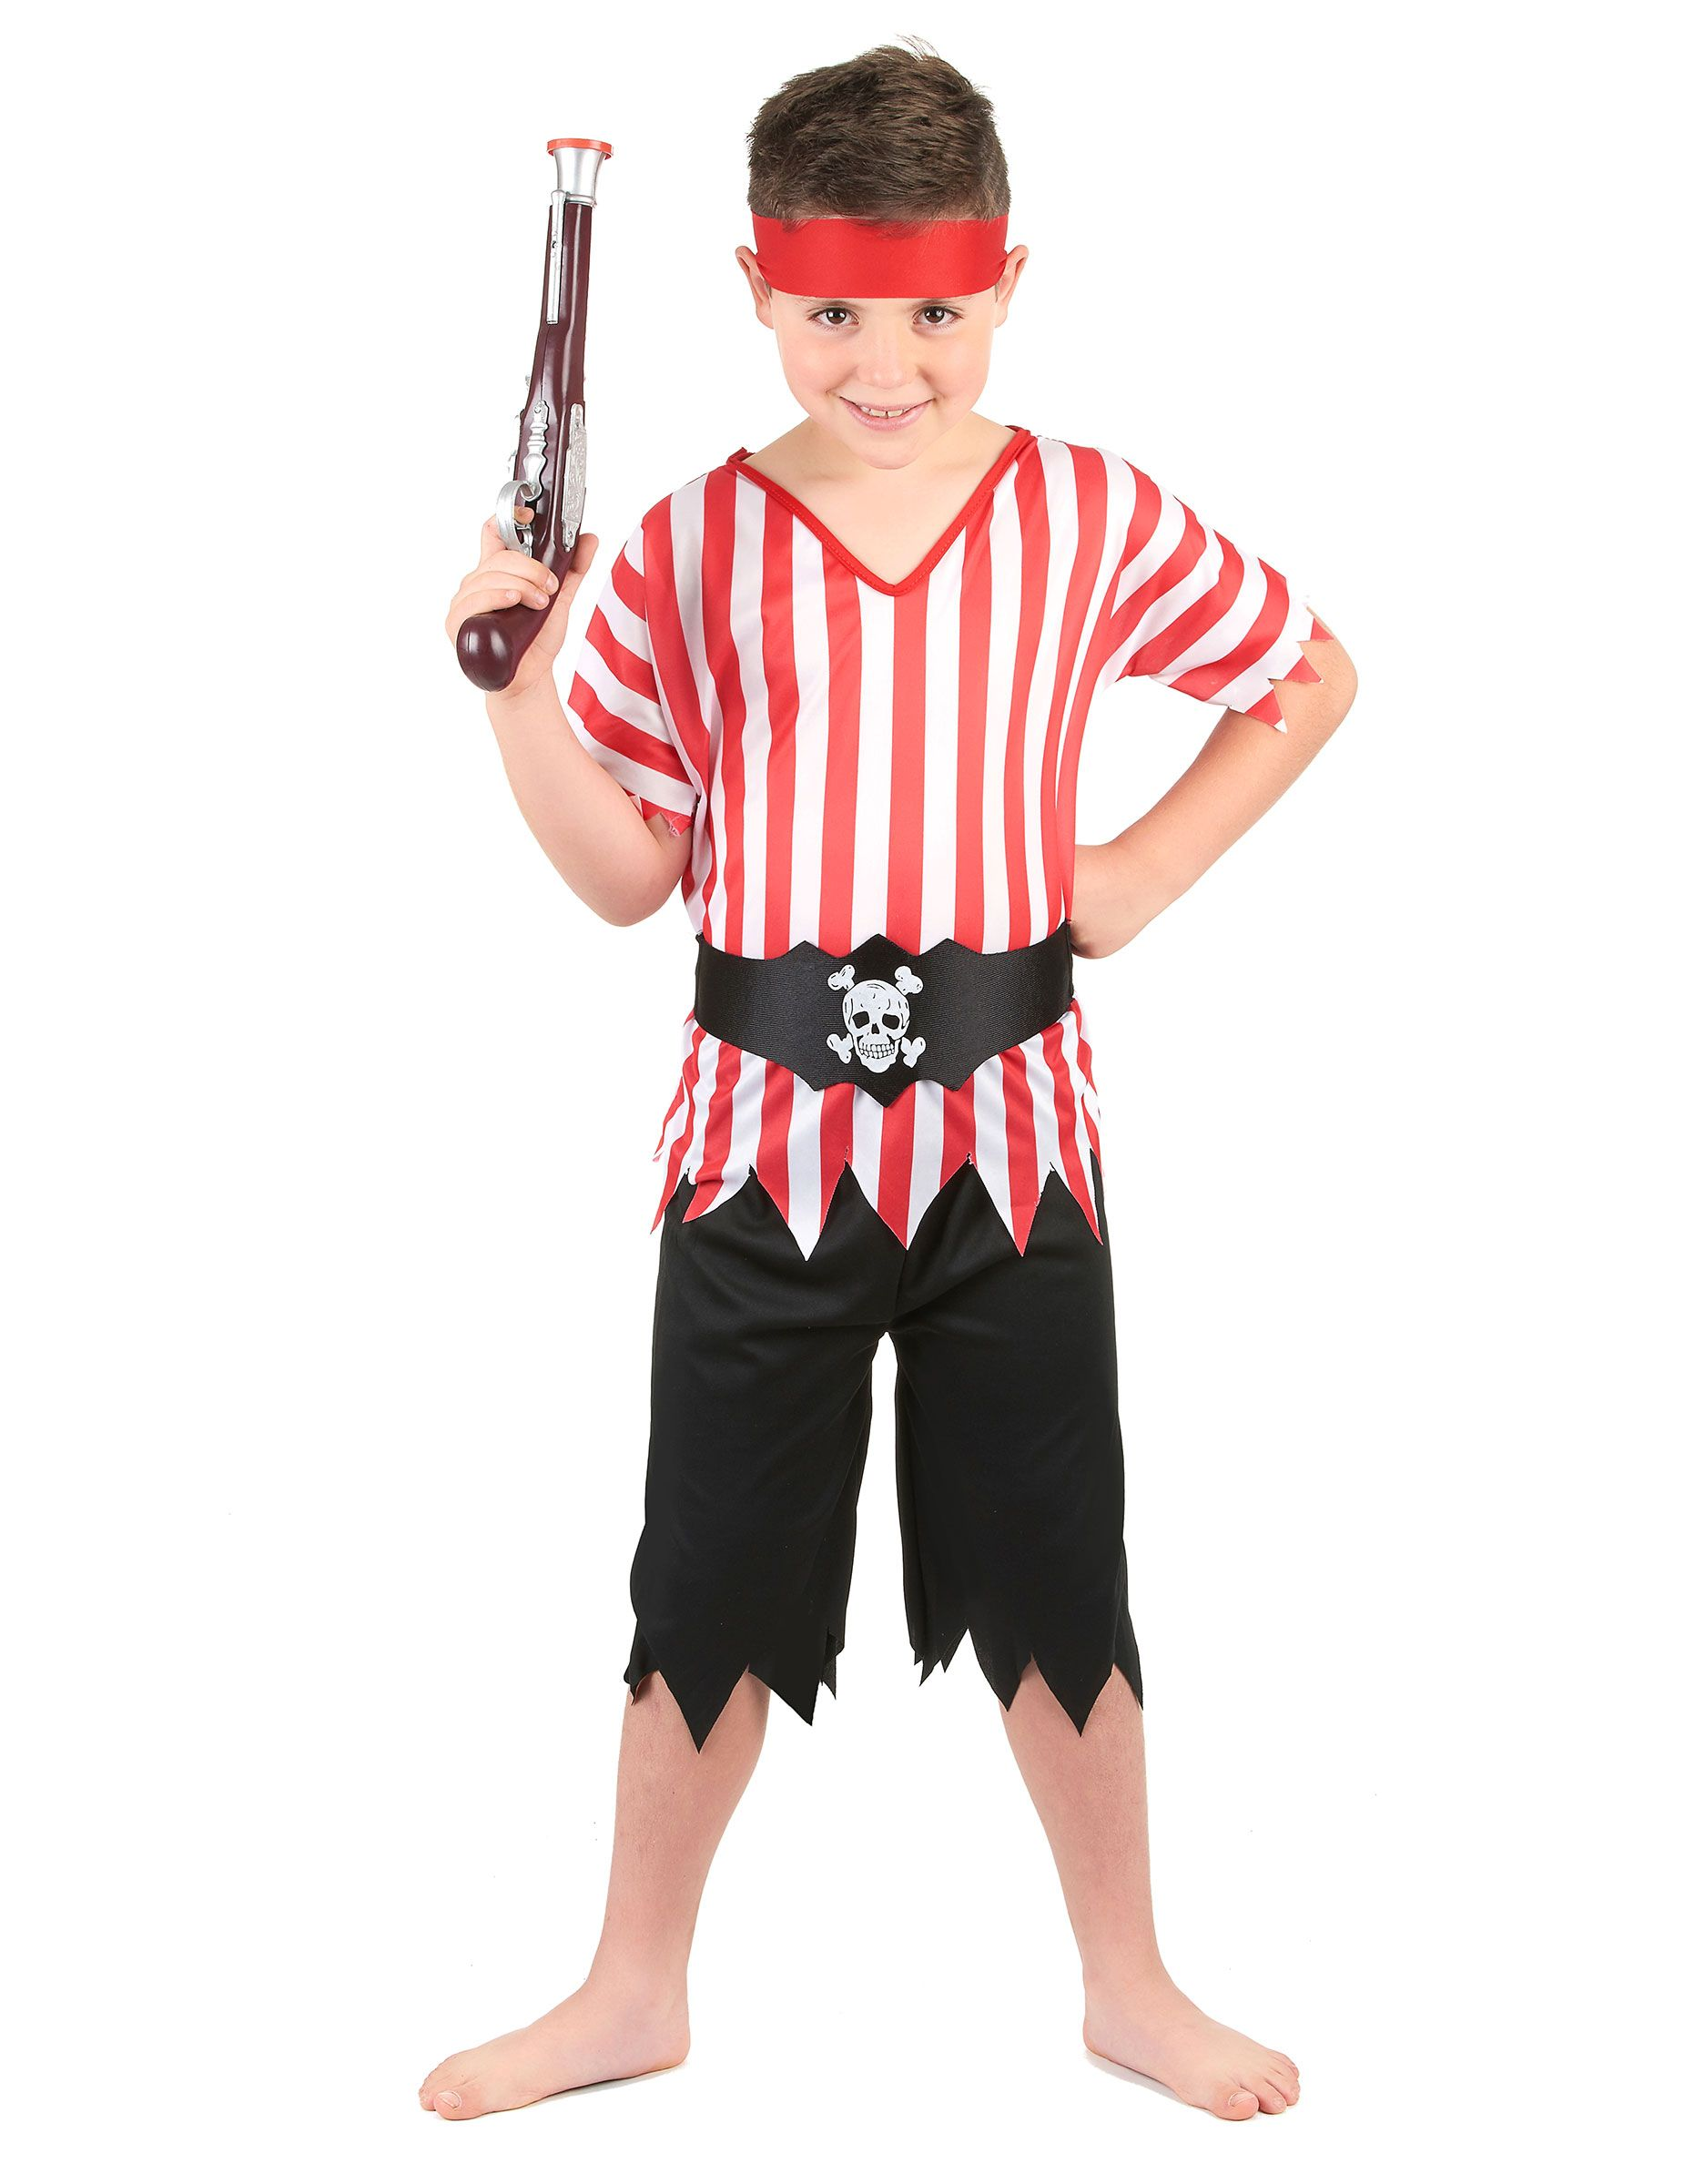 dd652a30dbb Disfraz de grumete pirata para niño  Este disfraz de grumete pirata para  niño se compone